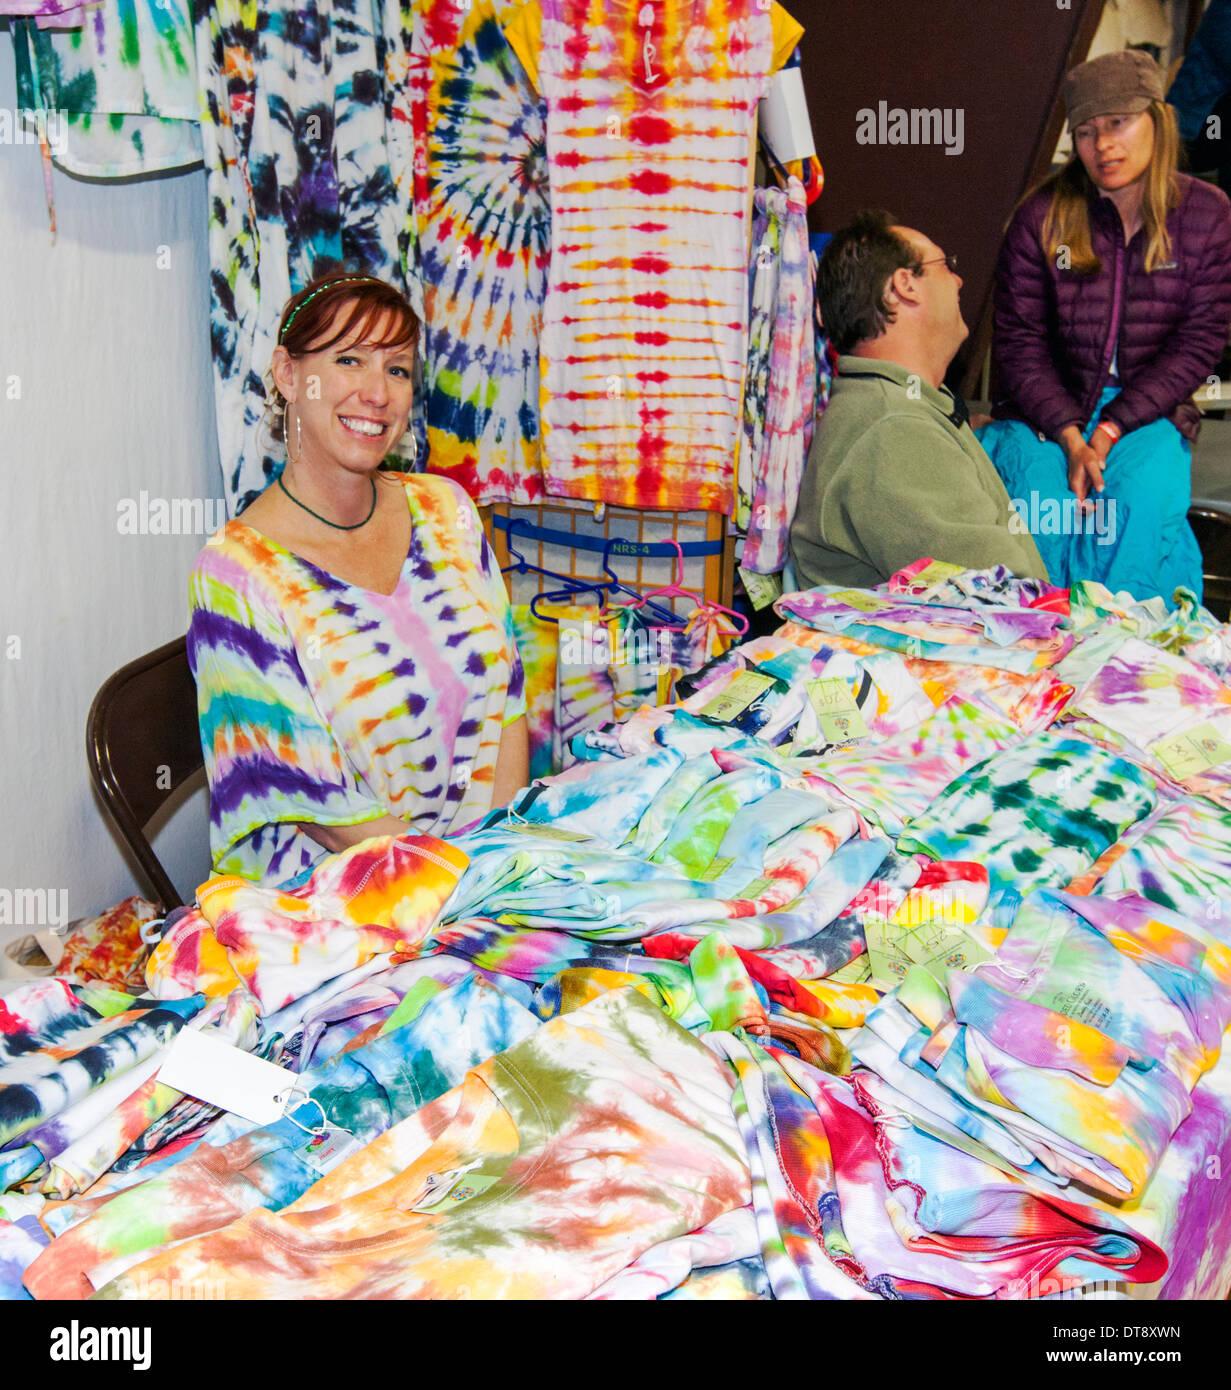 Venditore a vendere tie-tinto tee shirt all'arca alta valle rulli Roller Derby, Chaffee County Fairgrounds, Colorado, STATI UNITI D'AMERICA Immagini Stock